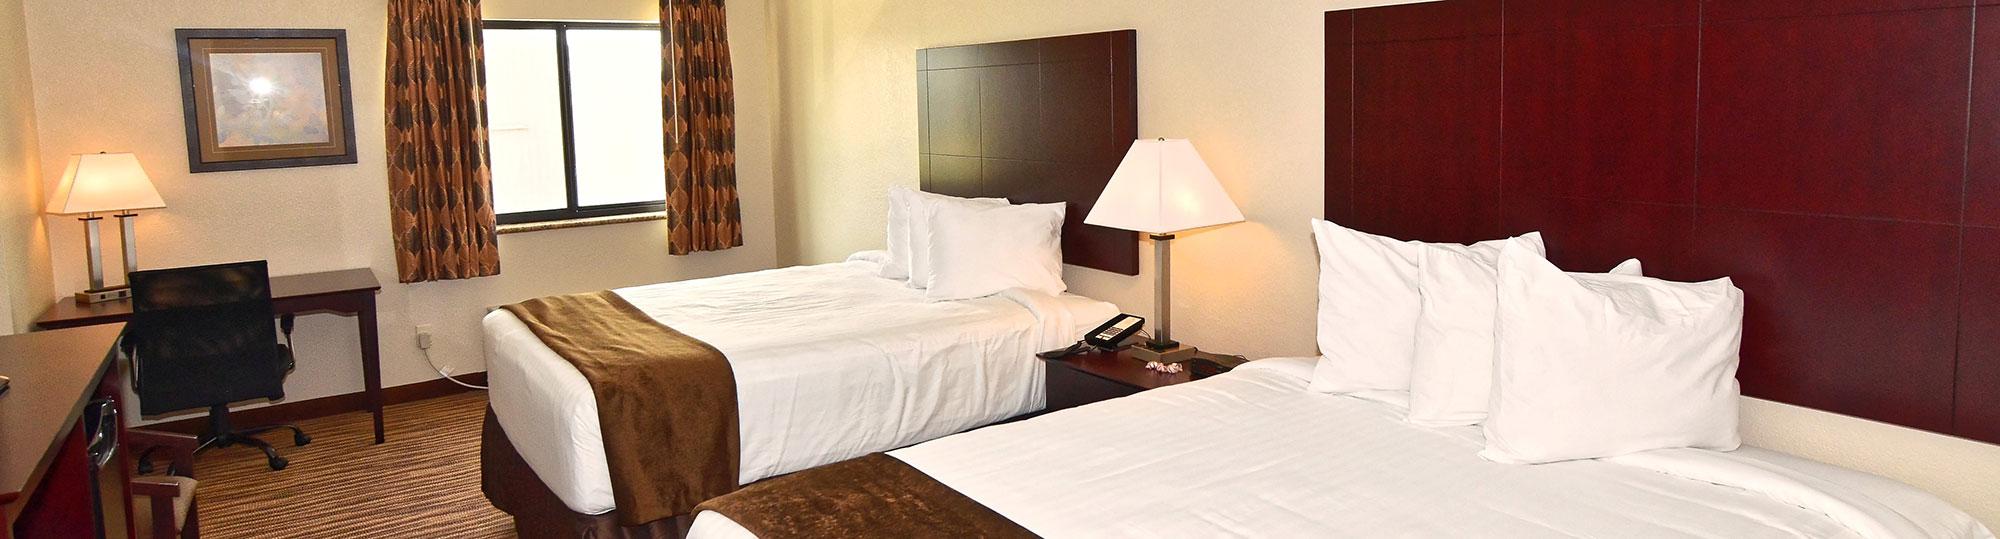 Cobblestone Inn and Suites Clarion